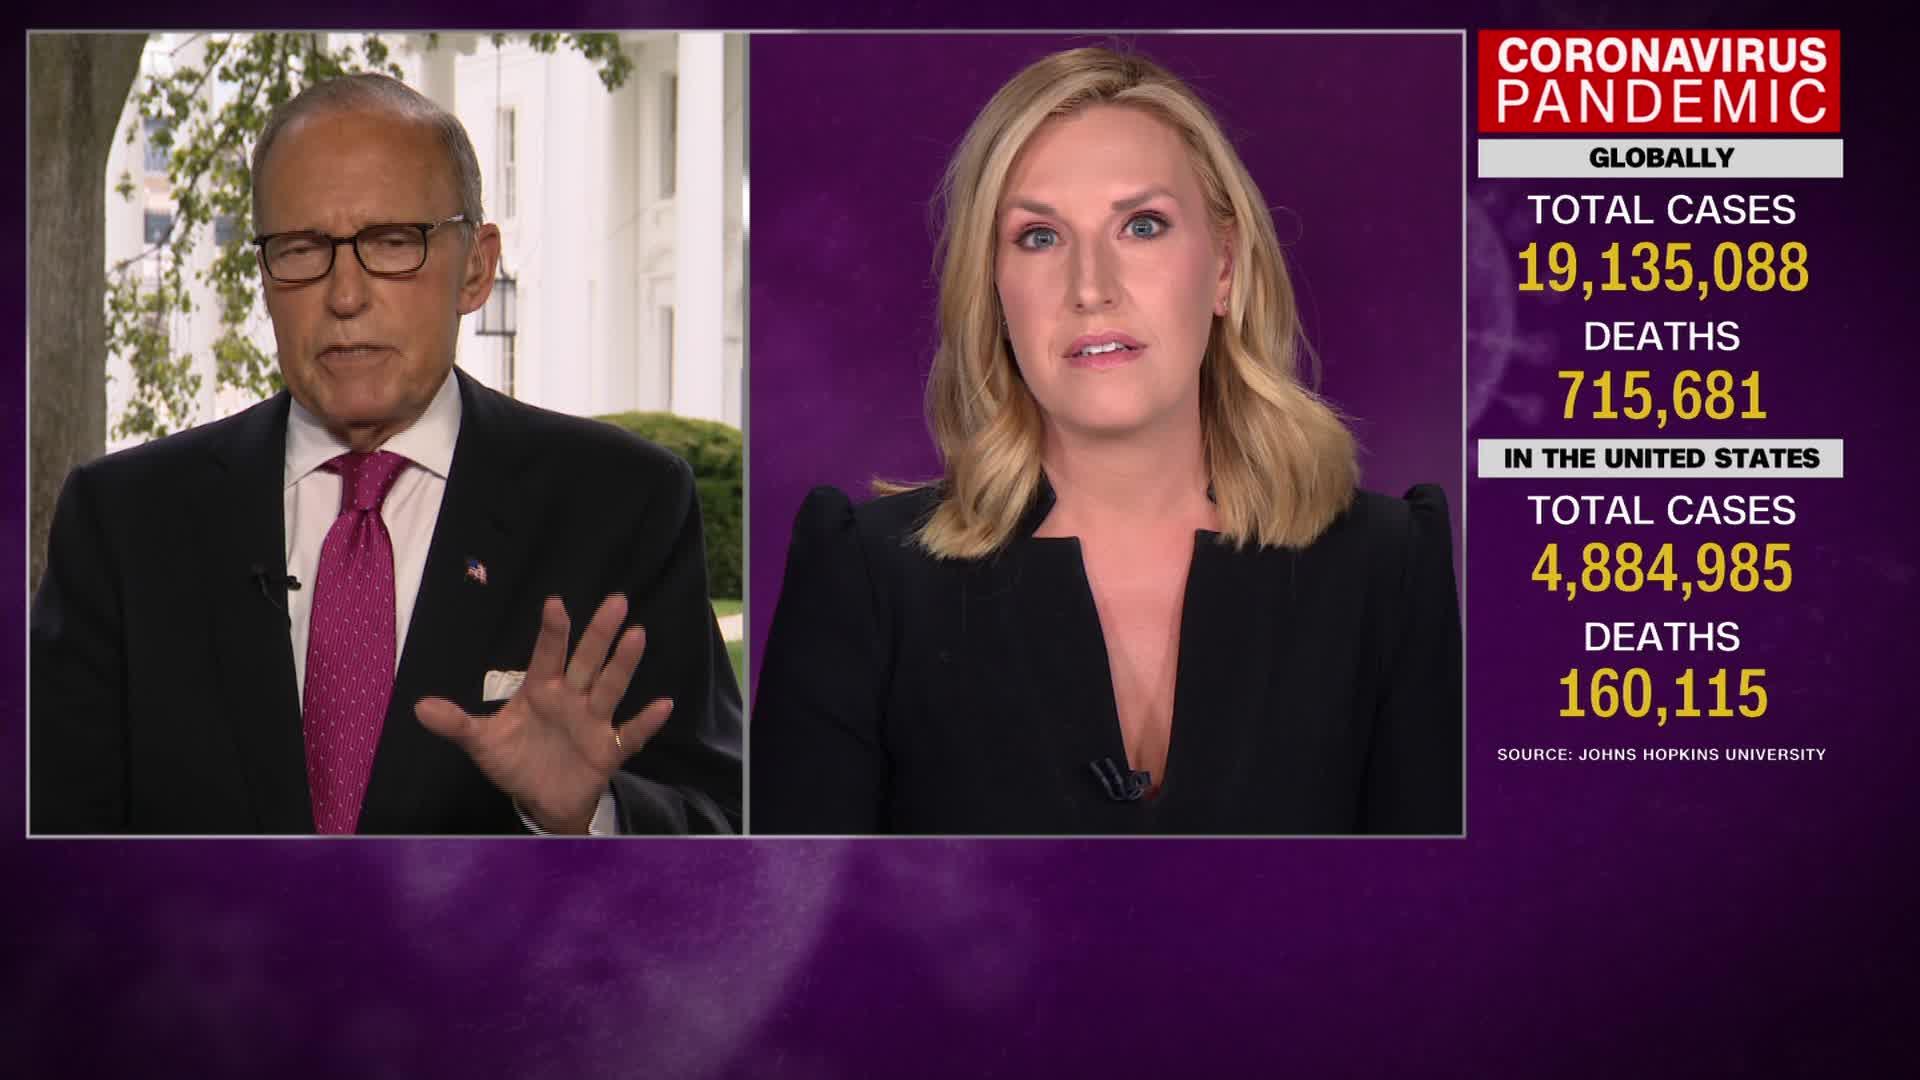 In a heated exchange, CNN's Poppy Harlow confronts Trump's top economic adviser